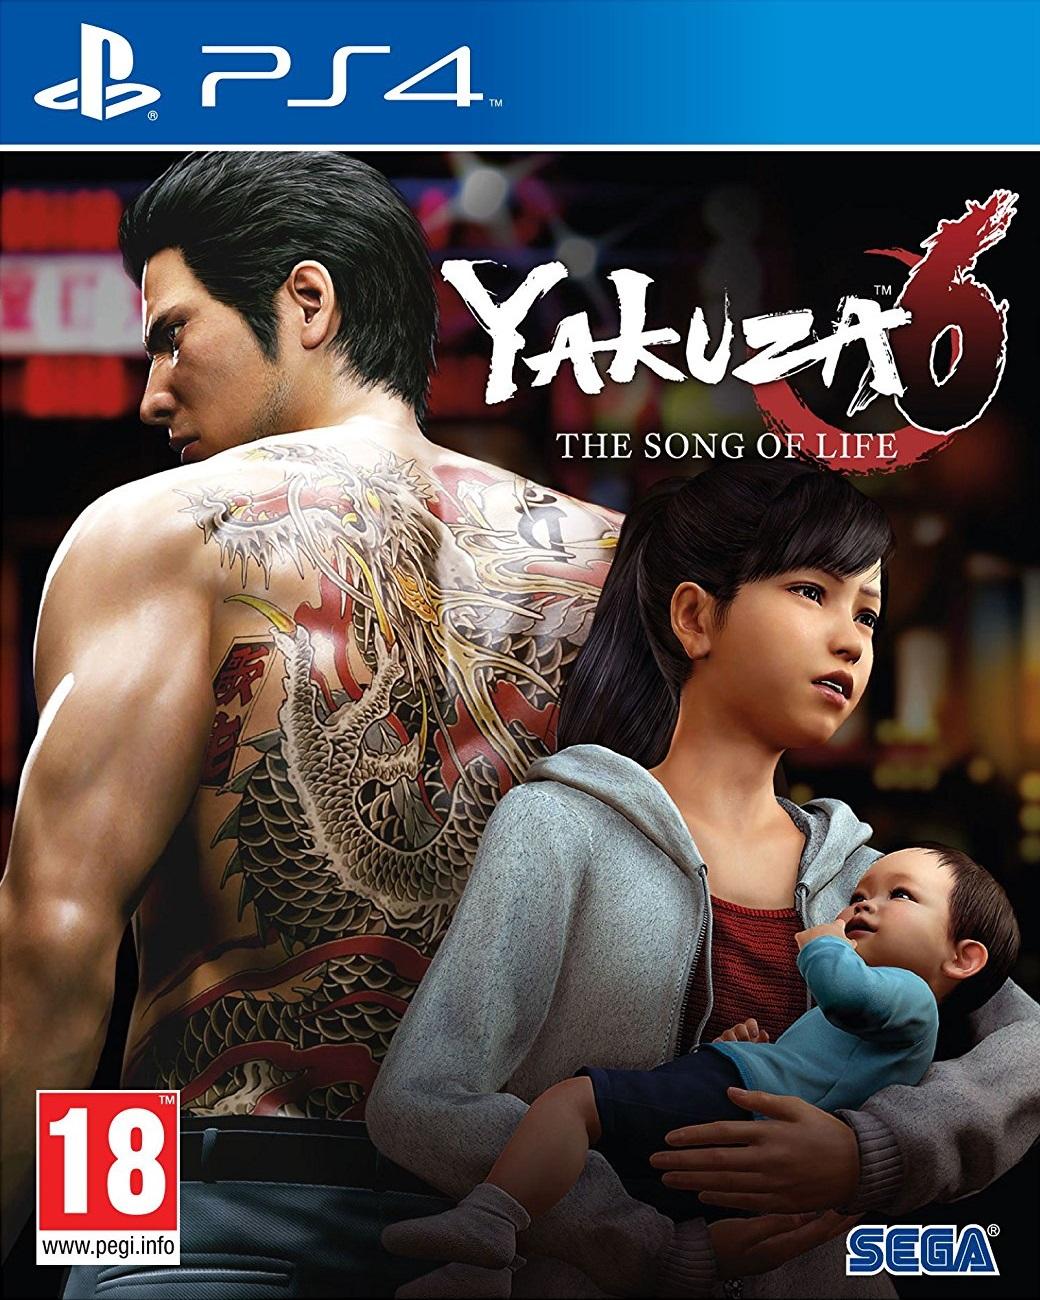 Yakuza 6 The Song Of Life Essence Art Edition - PlayStation 4 Játékok